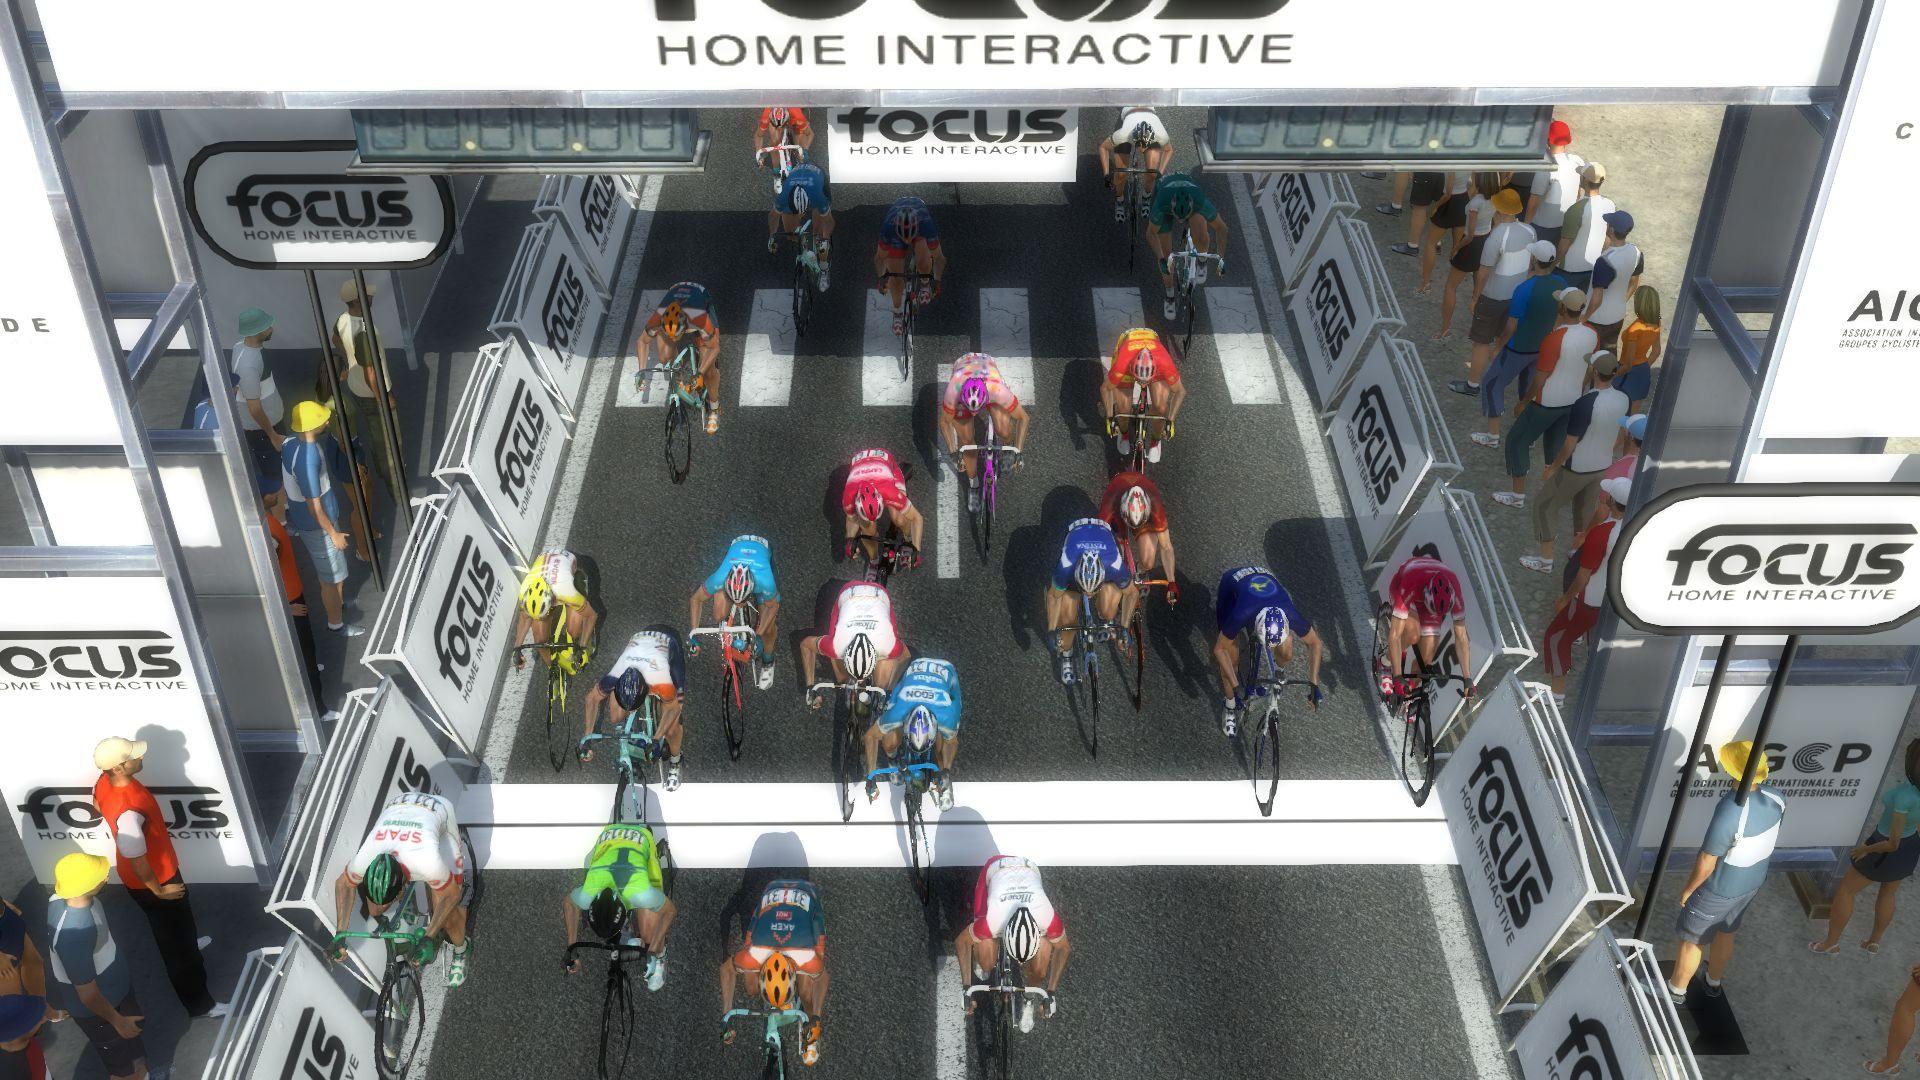 pcmdaily.com/images/mg/2019/Races/PT/Qatar/mg19_qat_s01_21.jpg